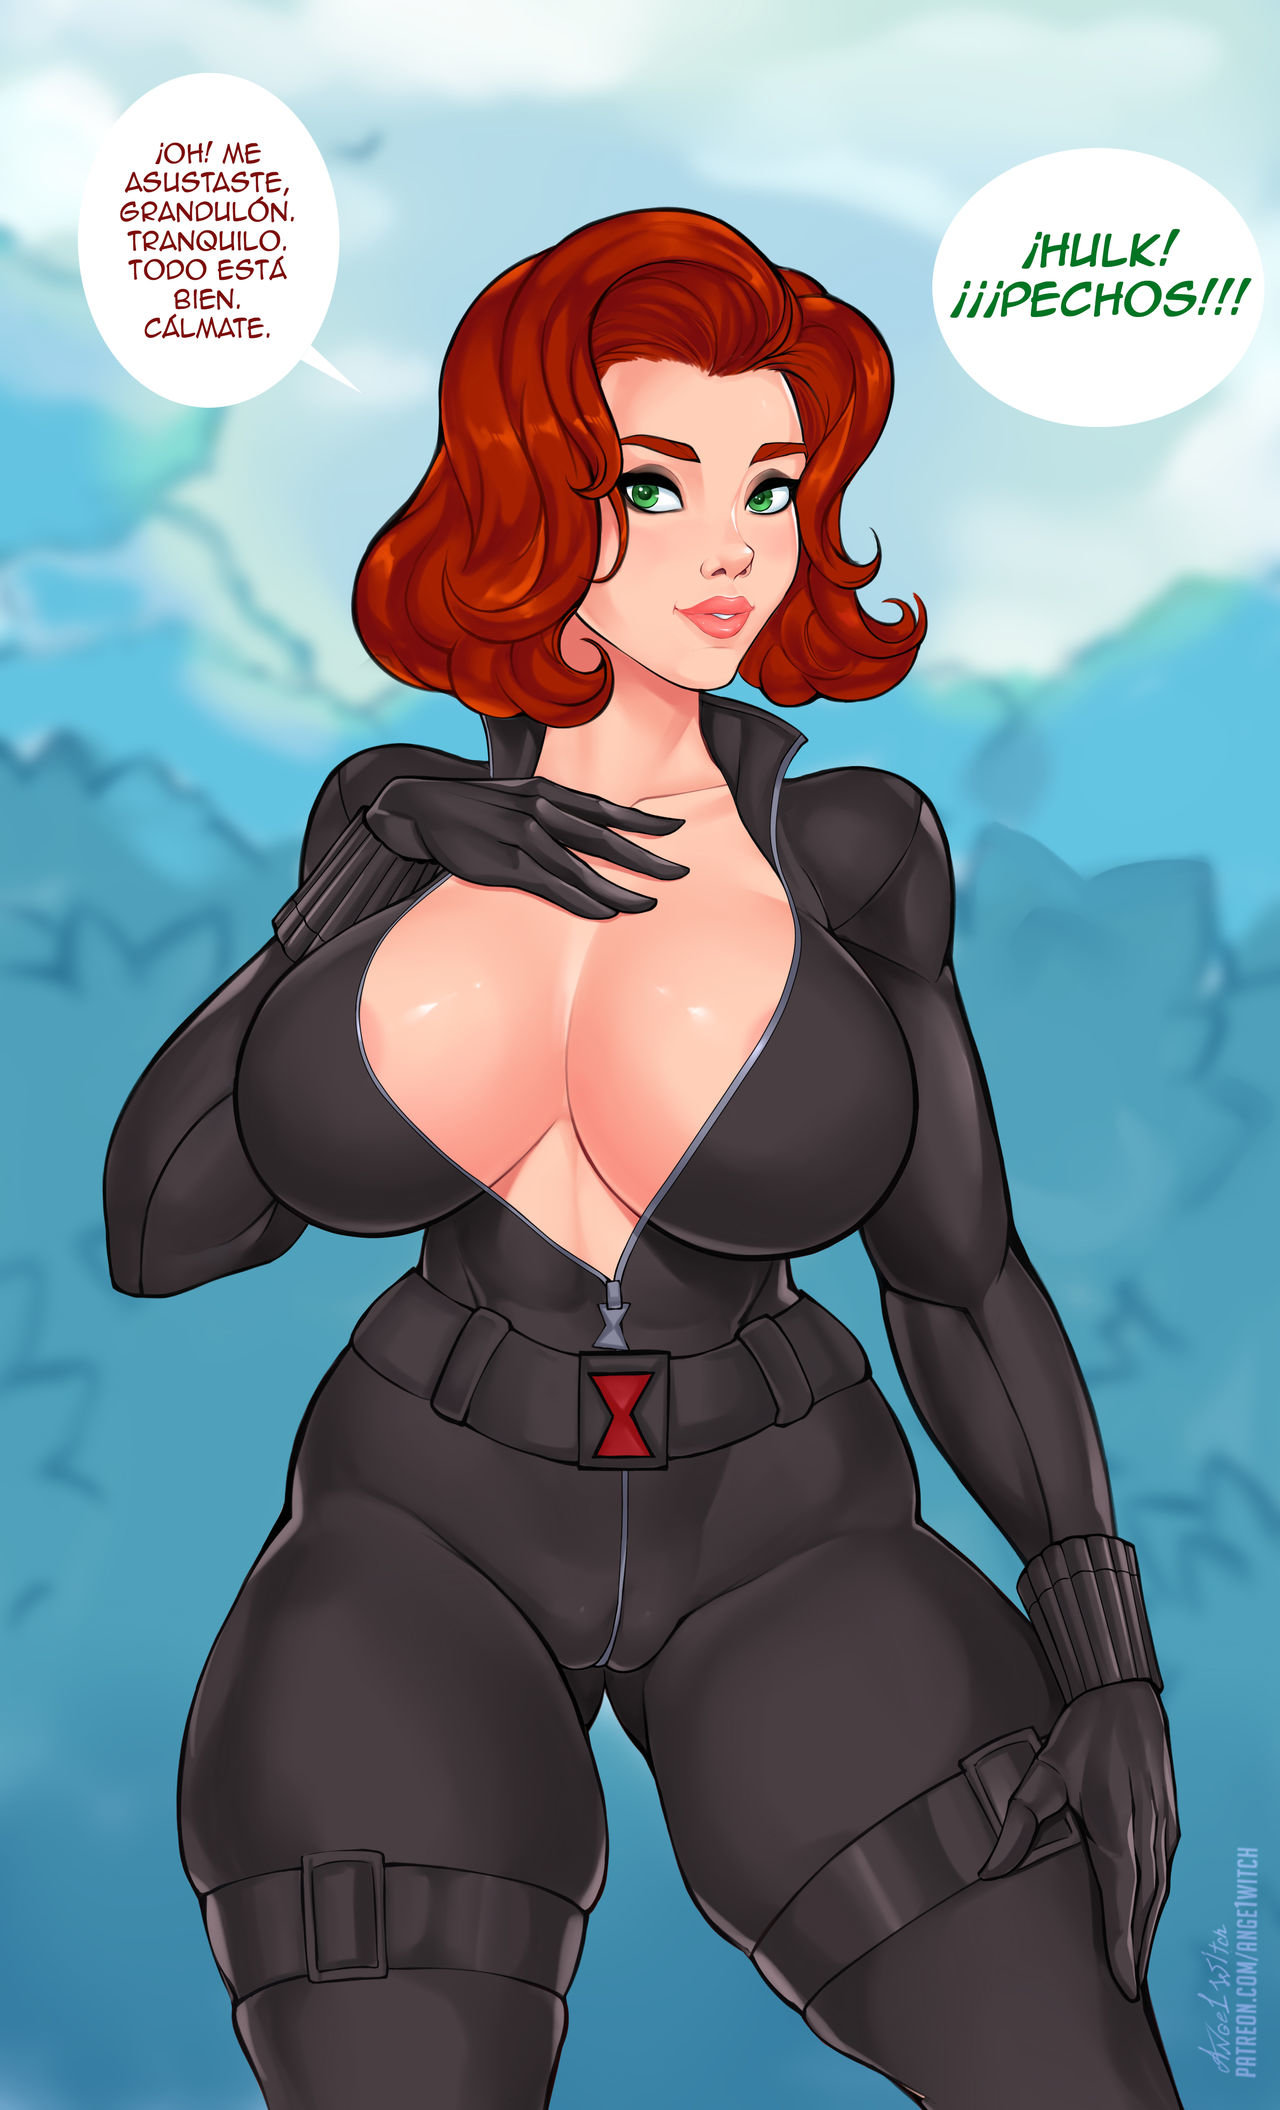 El Superpoder de BLACK WIDOW